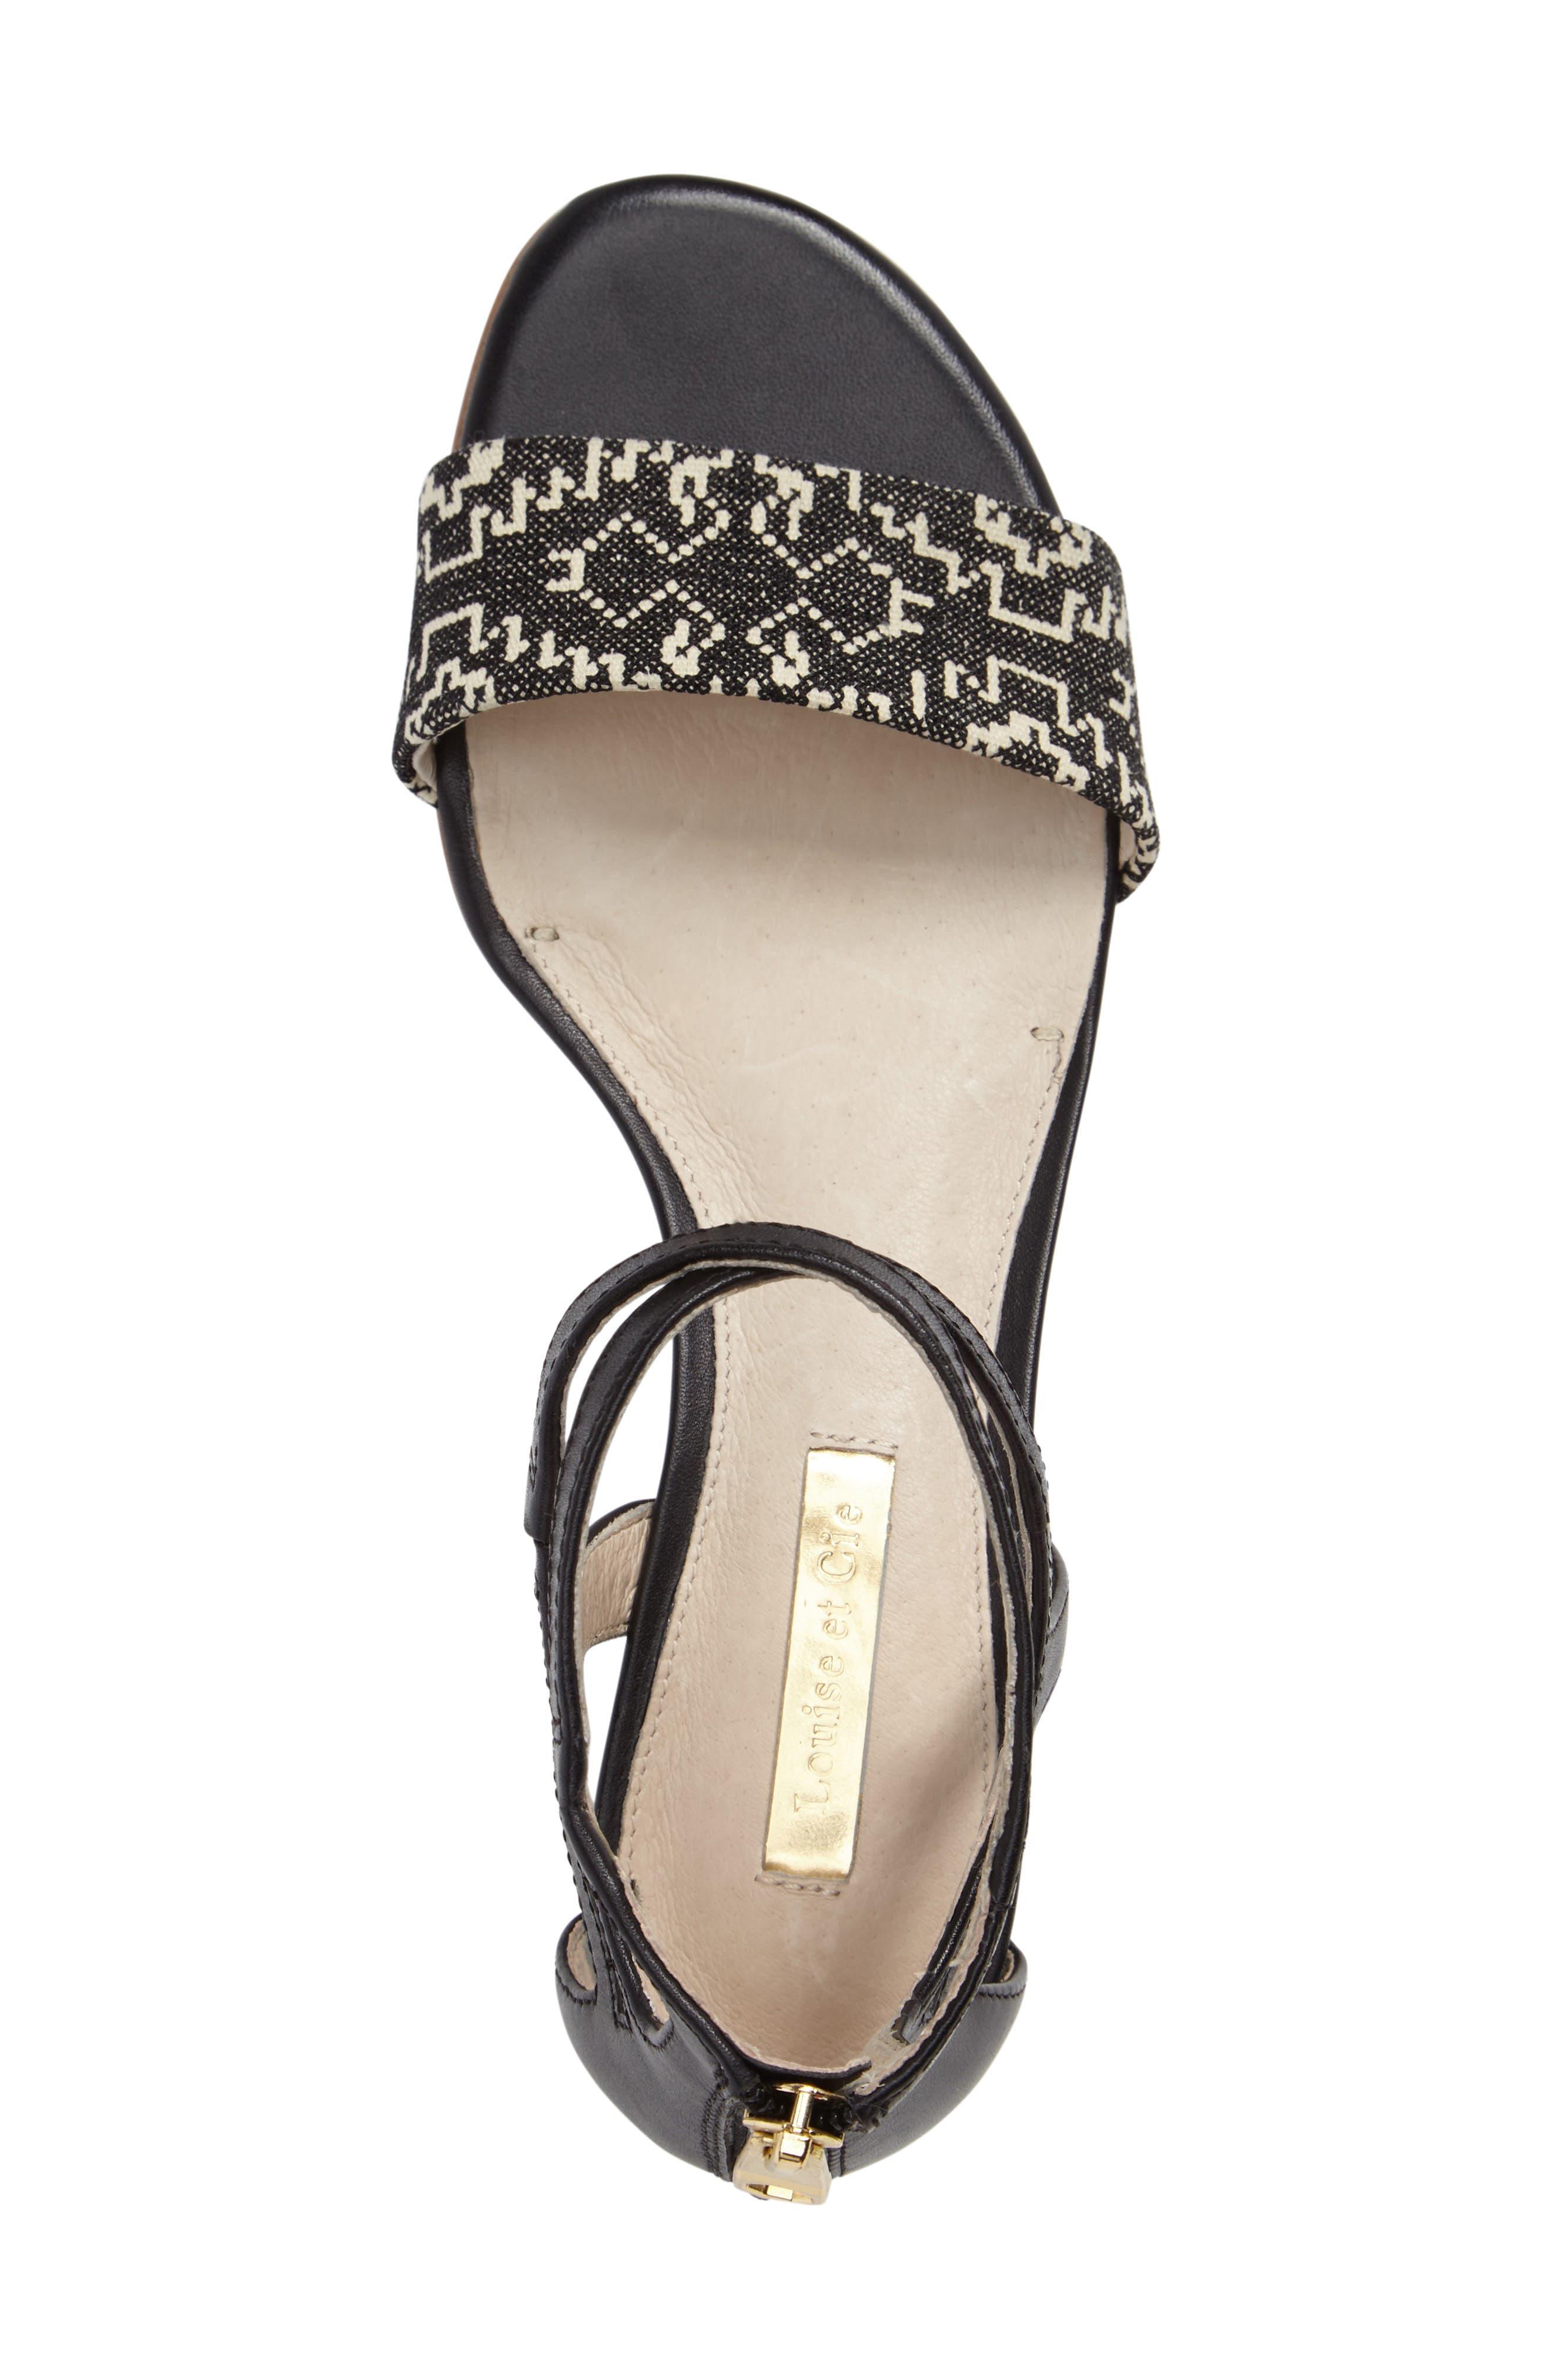 Adley Ankle Strap Sandal,                             Alternate thumbnail 3, color,                             002